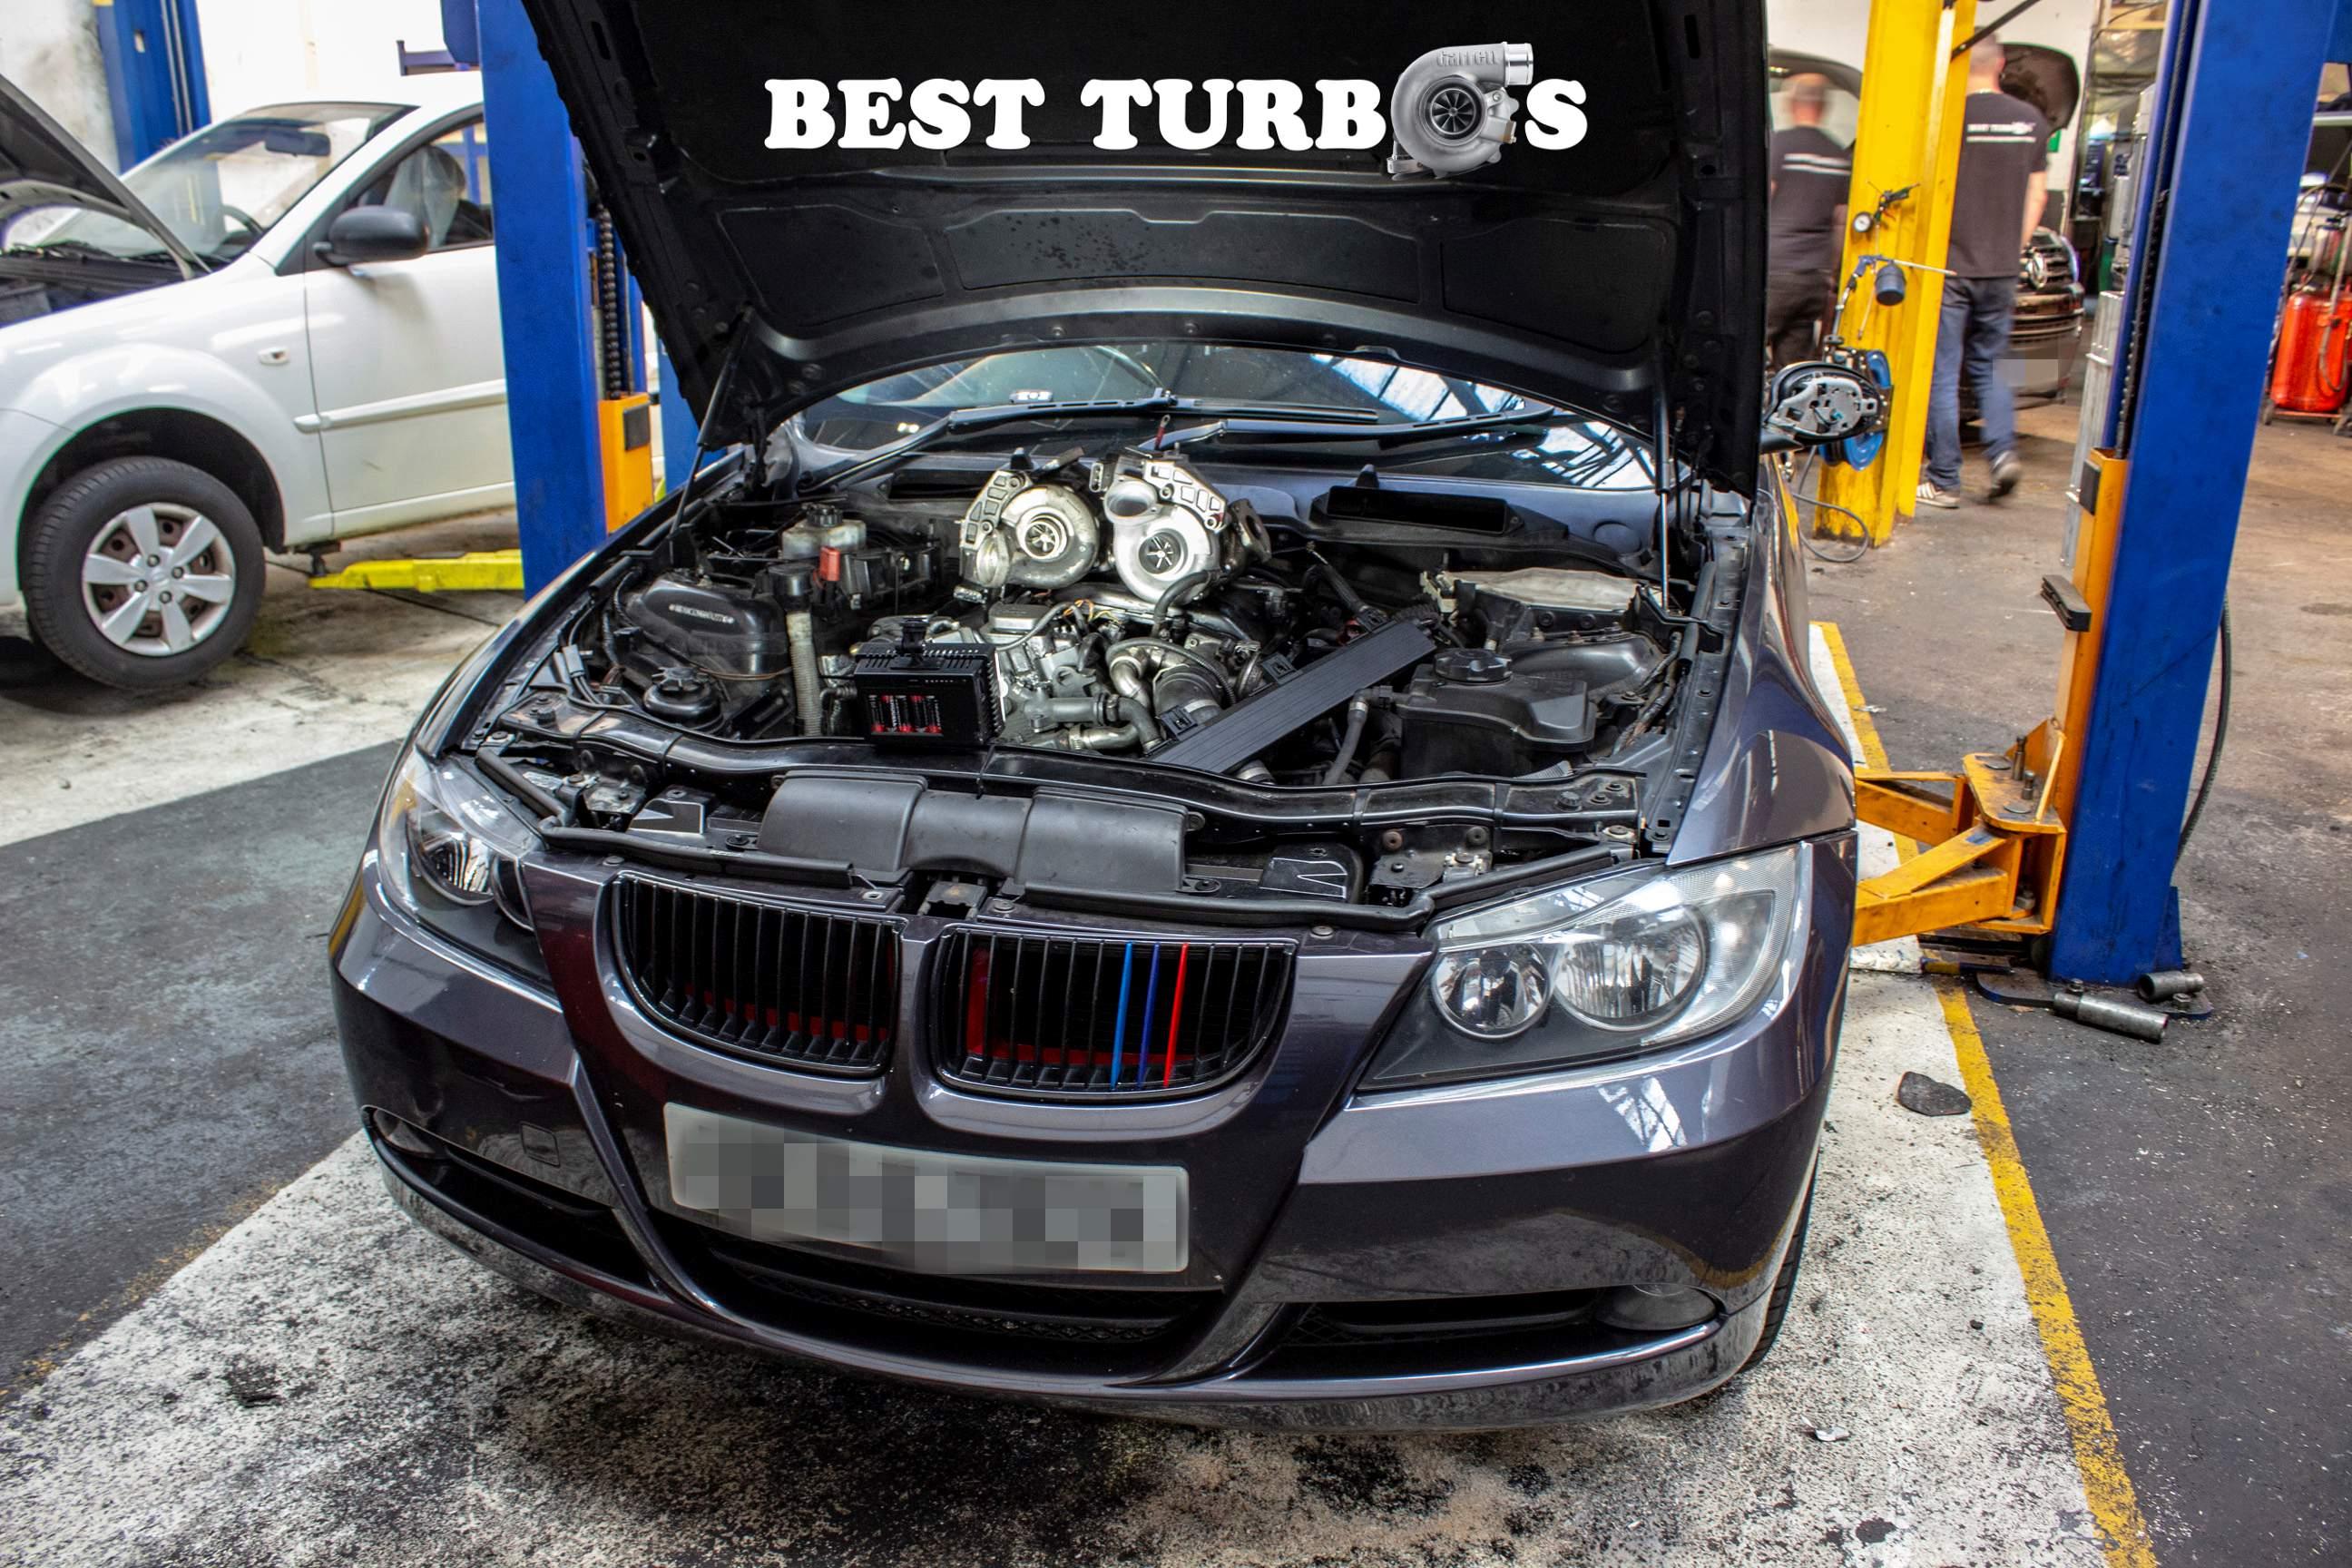 BMW 320d Hybrid Turbo Upgrade Birmingham Oldbury Walsall